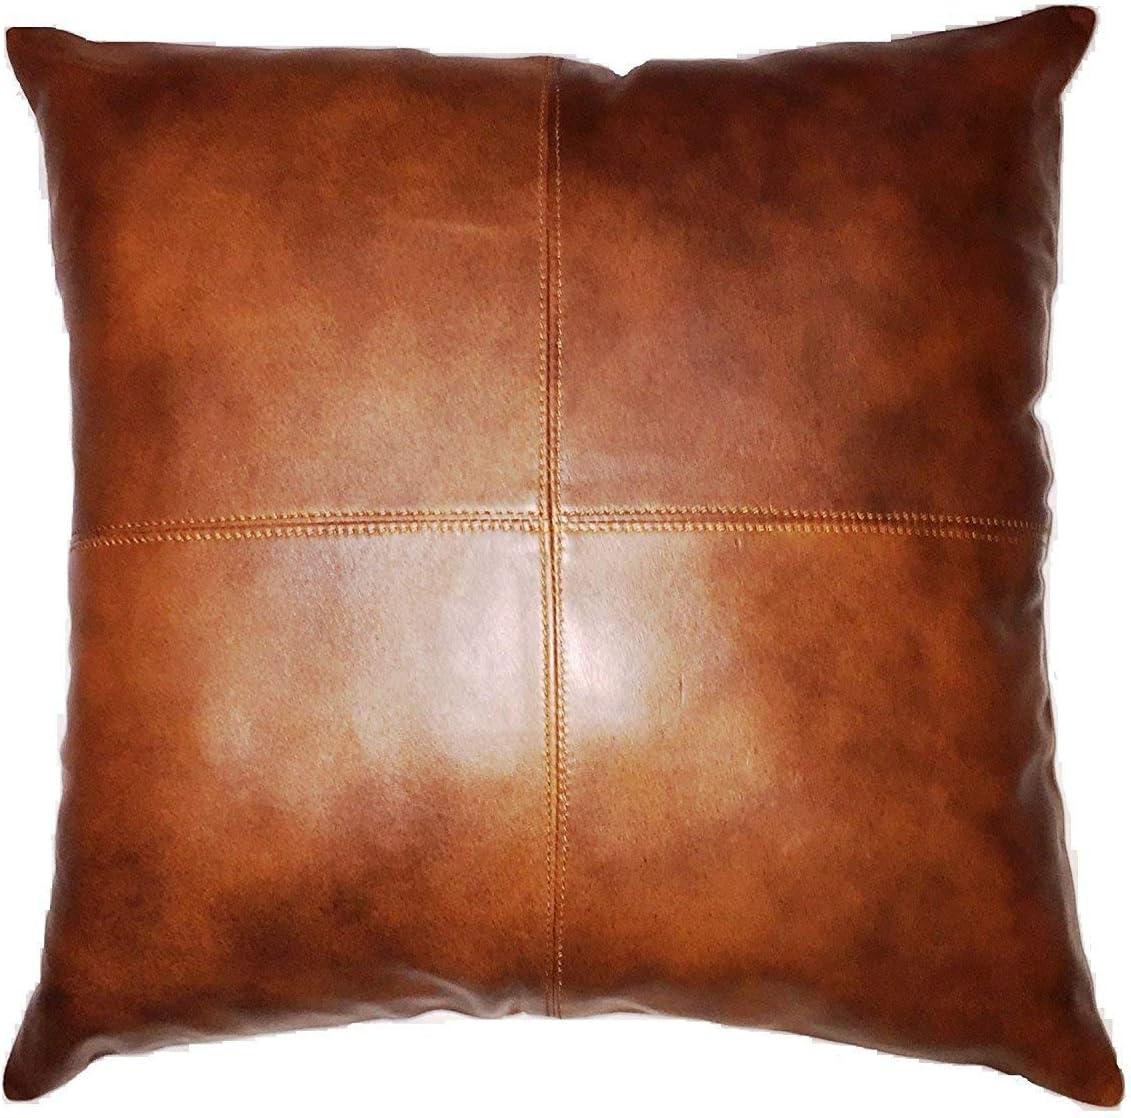 Leather Market 100% Lambskin Pillow Cover Sofa お得 ☆正規品新品未使用品 - Cushion